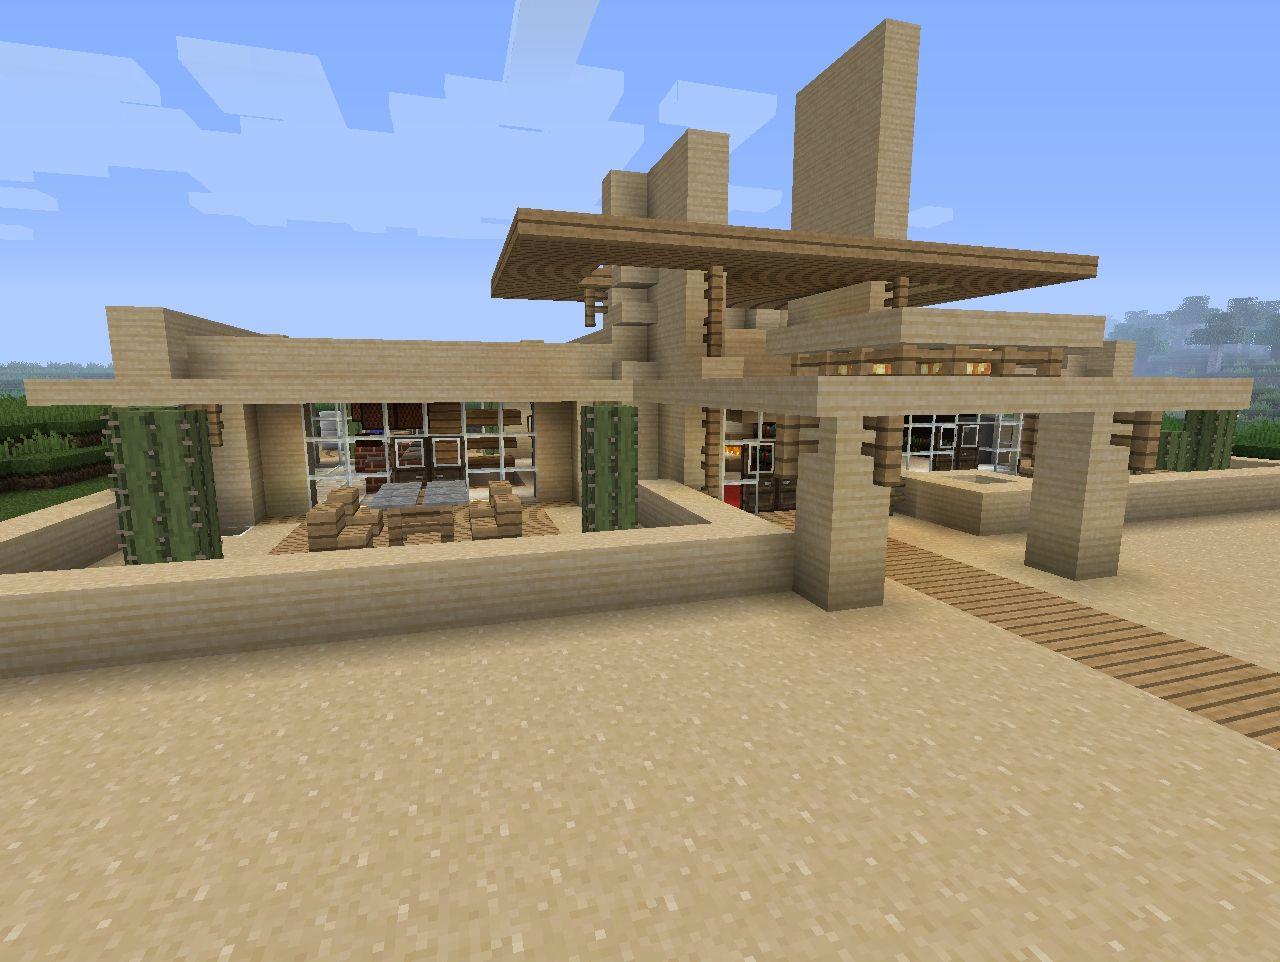 Pakistan modern home designs modern desert homes - Desert House Design Minecraft